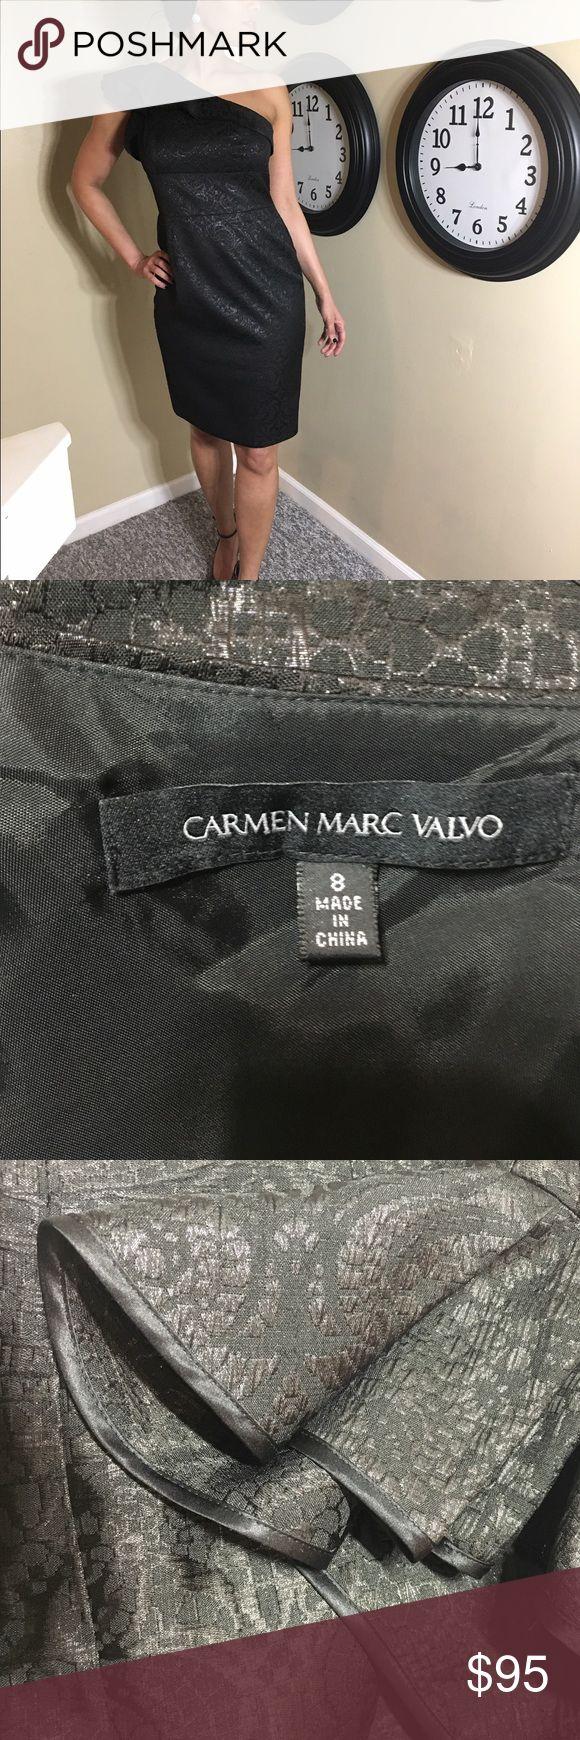 Carmen Marc Valvo black dress Gorgeous little black dress by Carmen Marc Valvo, black with metallic detail weaved through the fabric. Carmen Marc Valvo Dresses Midi